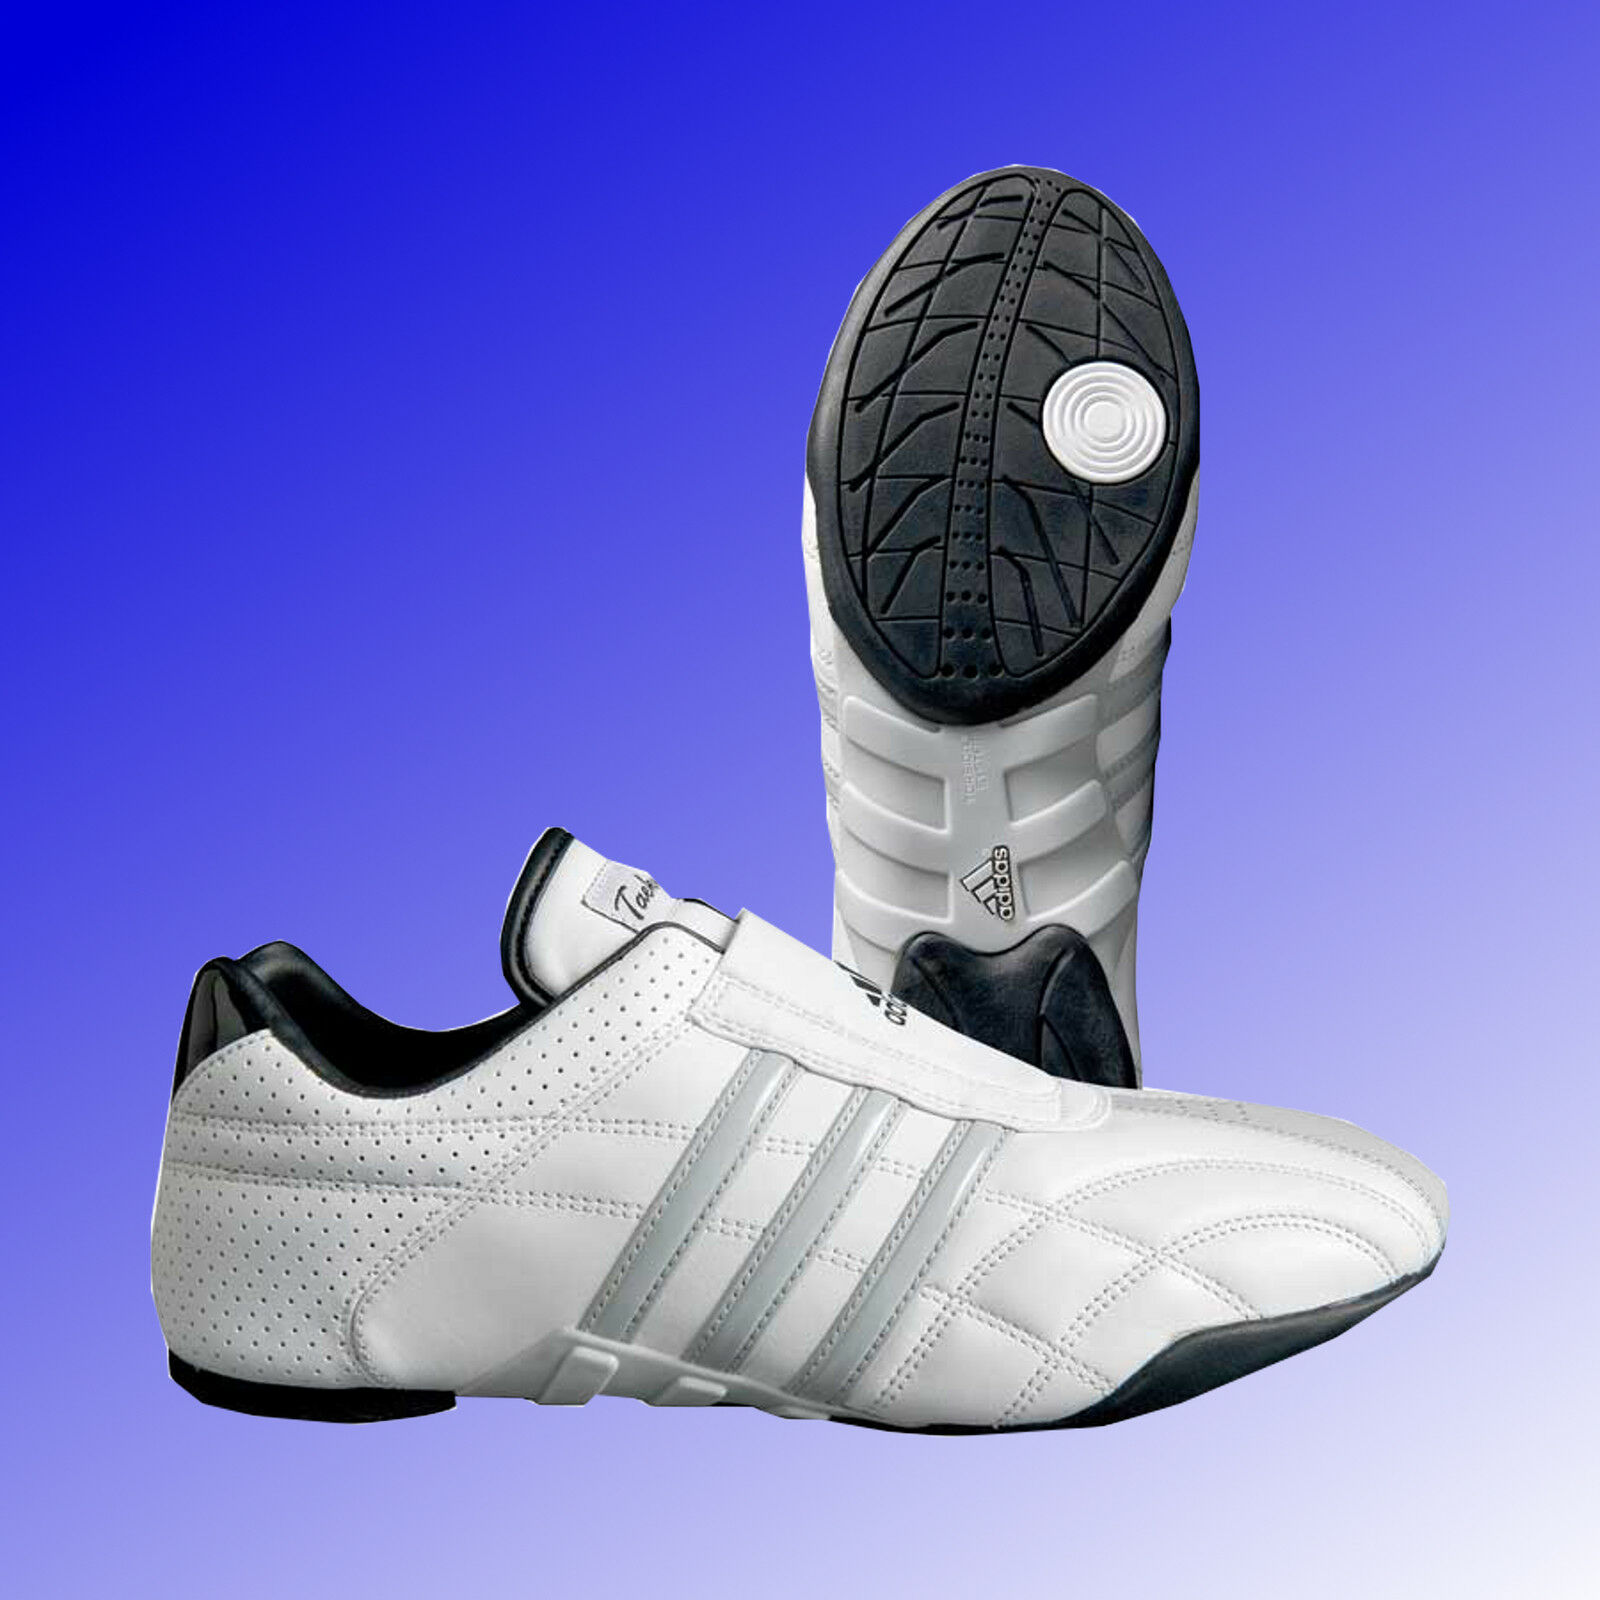 Adidas® Schuhe Adilux Taekwondo TKD Kampfsport Schuhe Adidas® Sneaker weiß grau Gr. 36 - 48 0b1702